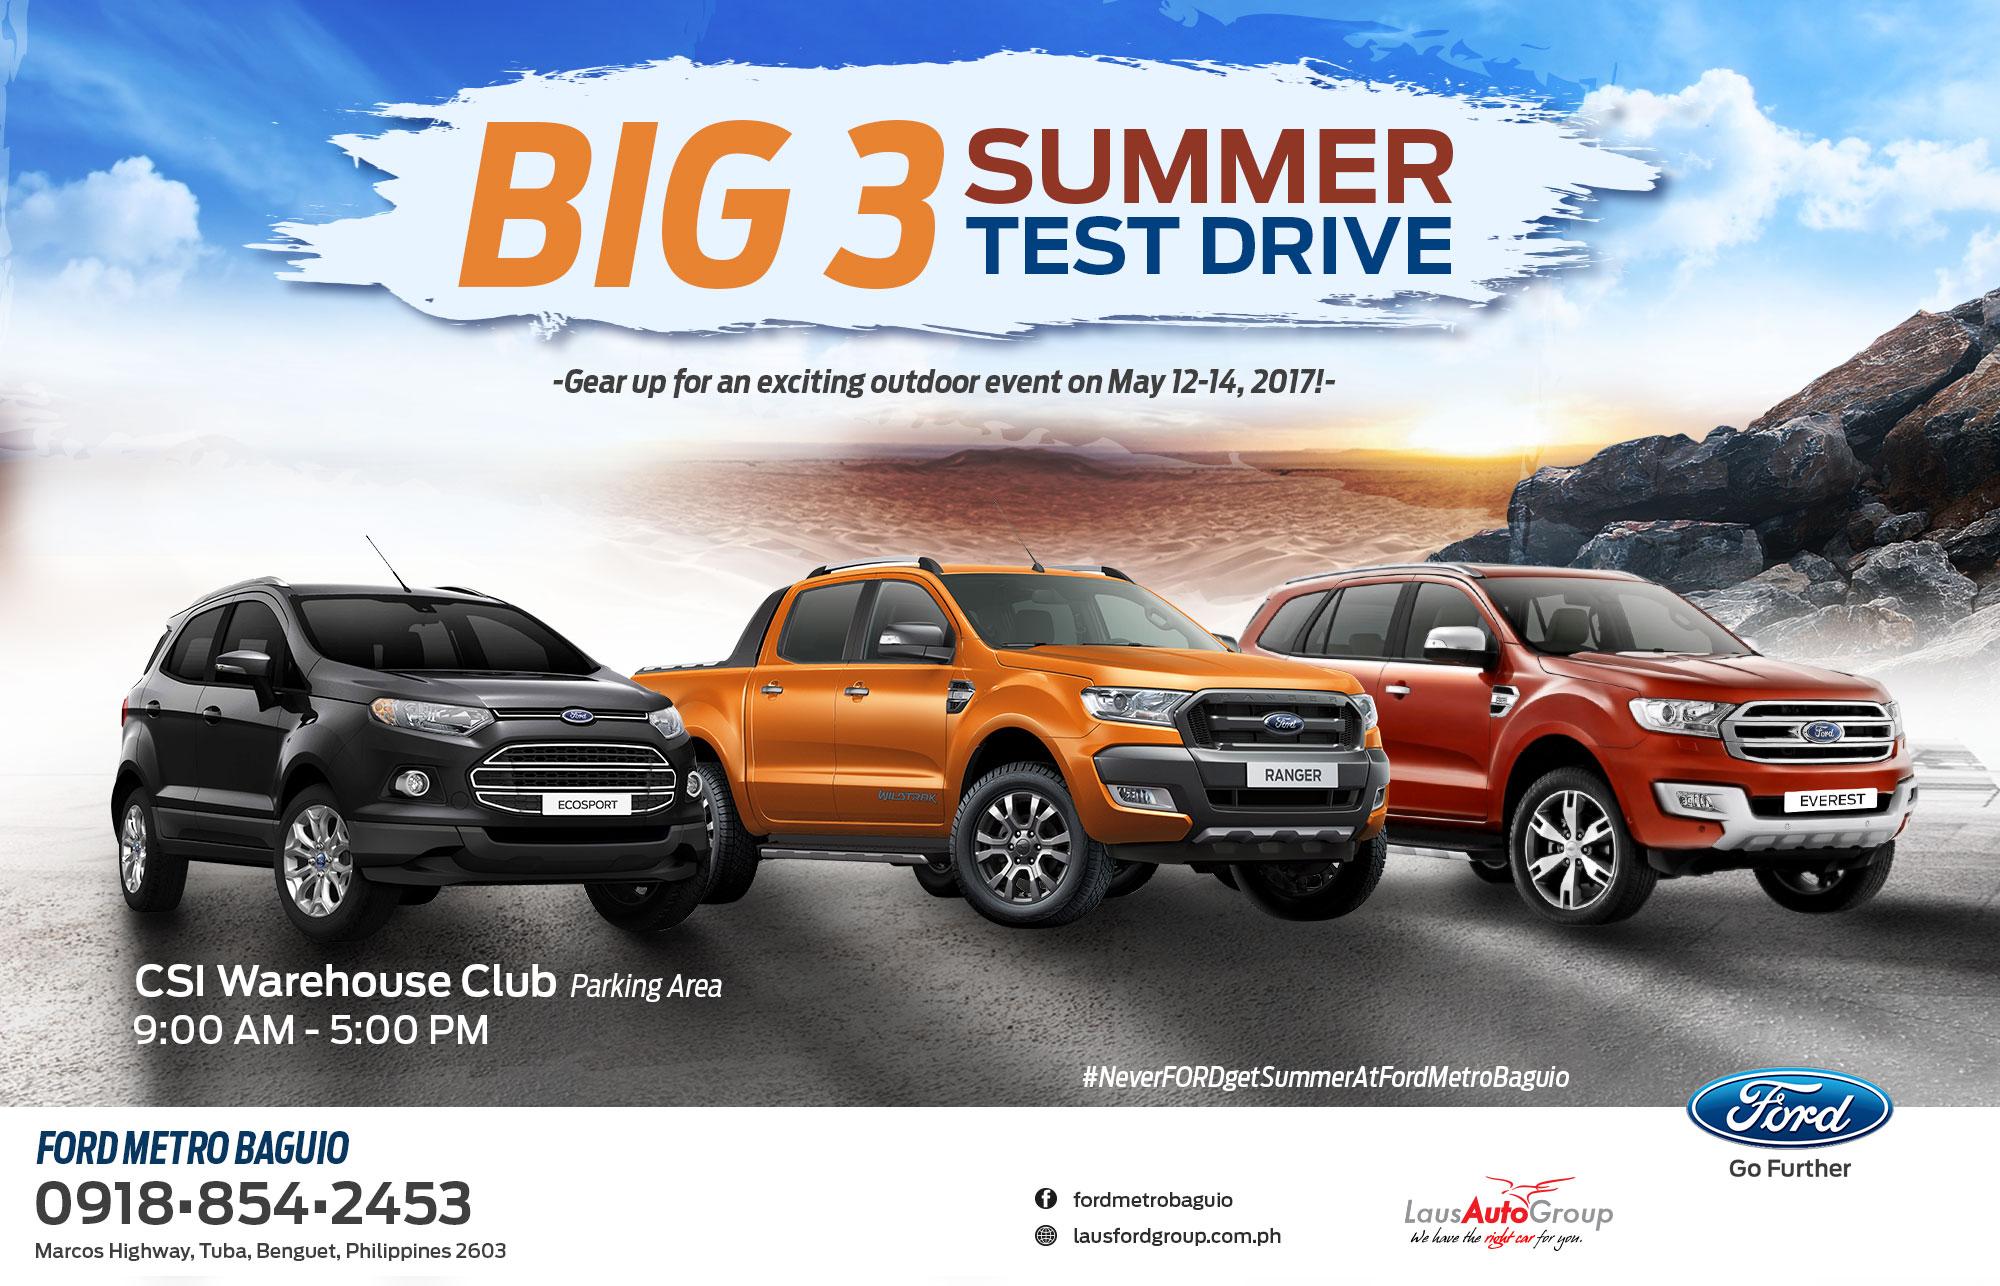 Big 3 Summer Test Drive